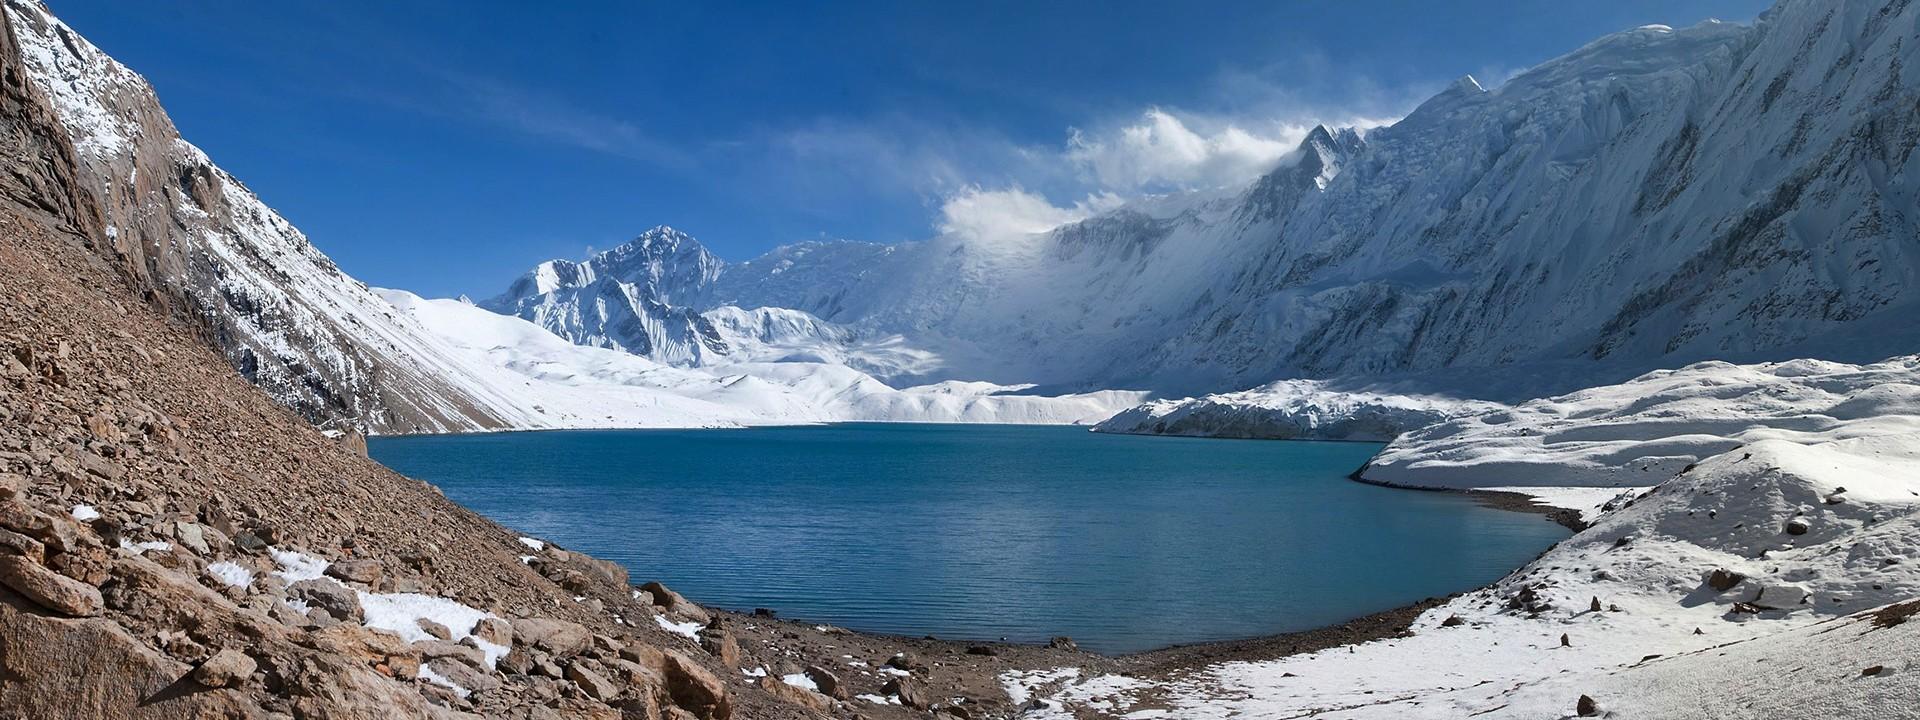 Annapurna Base Camp Trek with Tilicho Lake